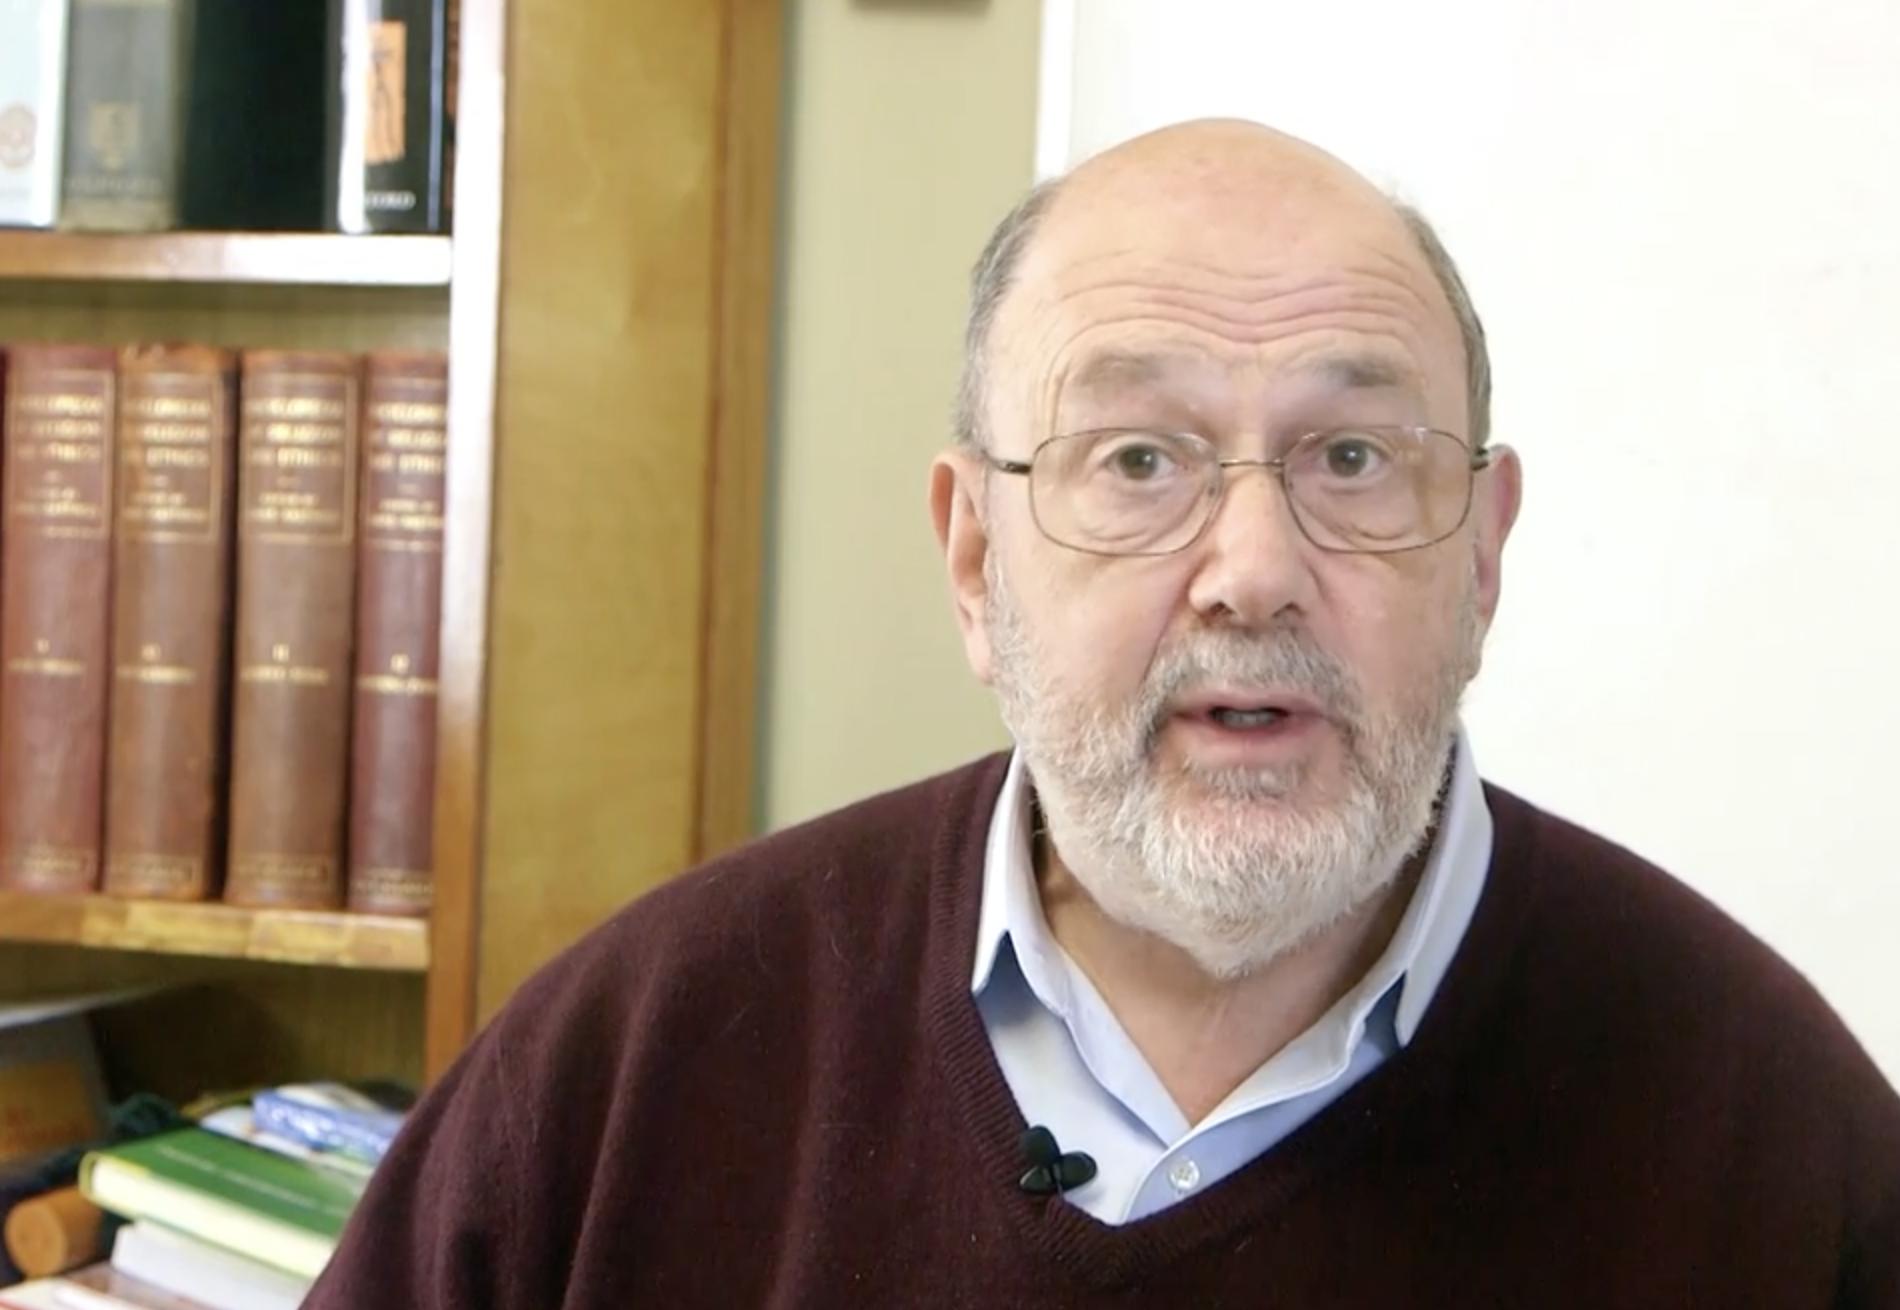 NT Wright on Galatians: Bible Study Series in Arnhem and Nijmegen